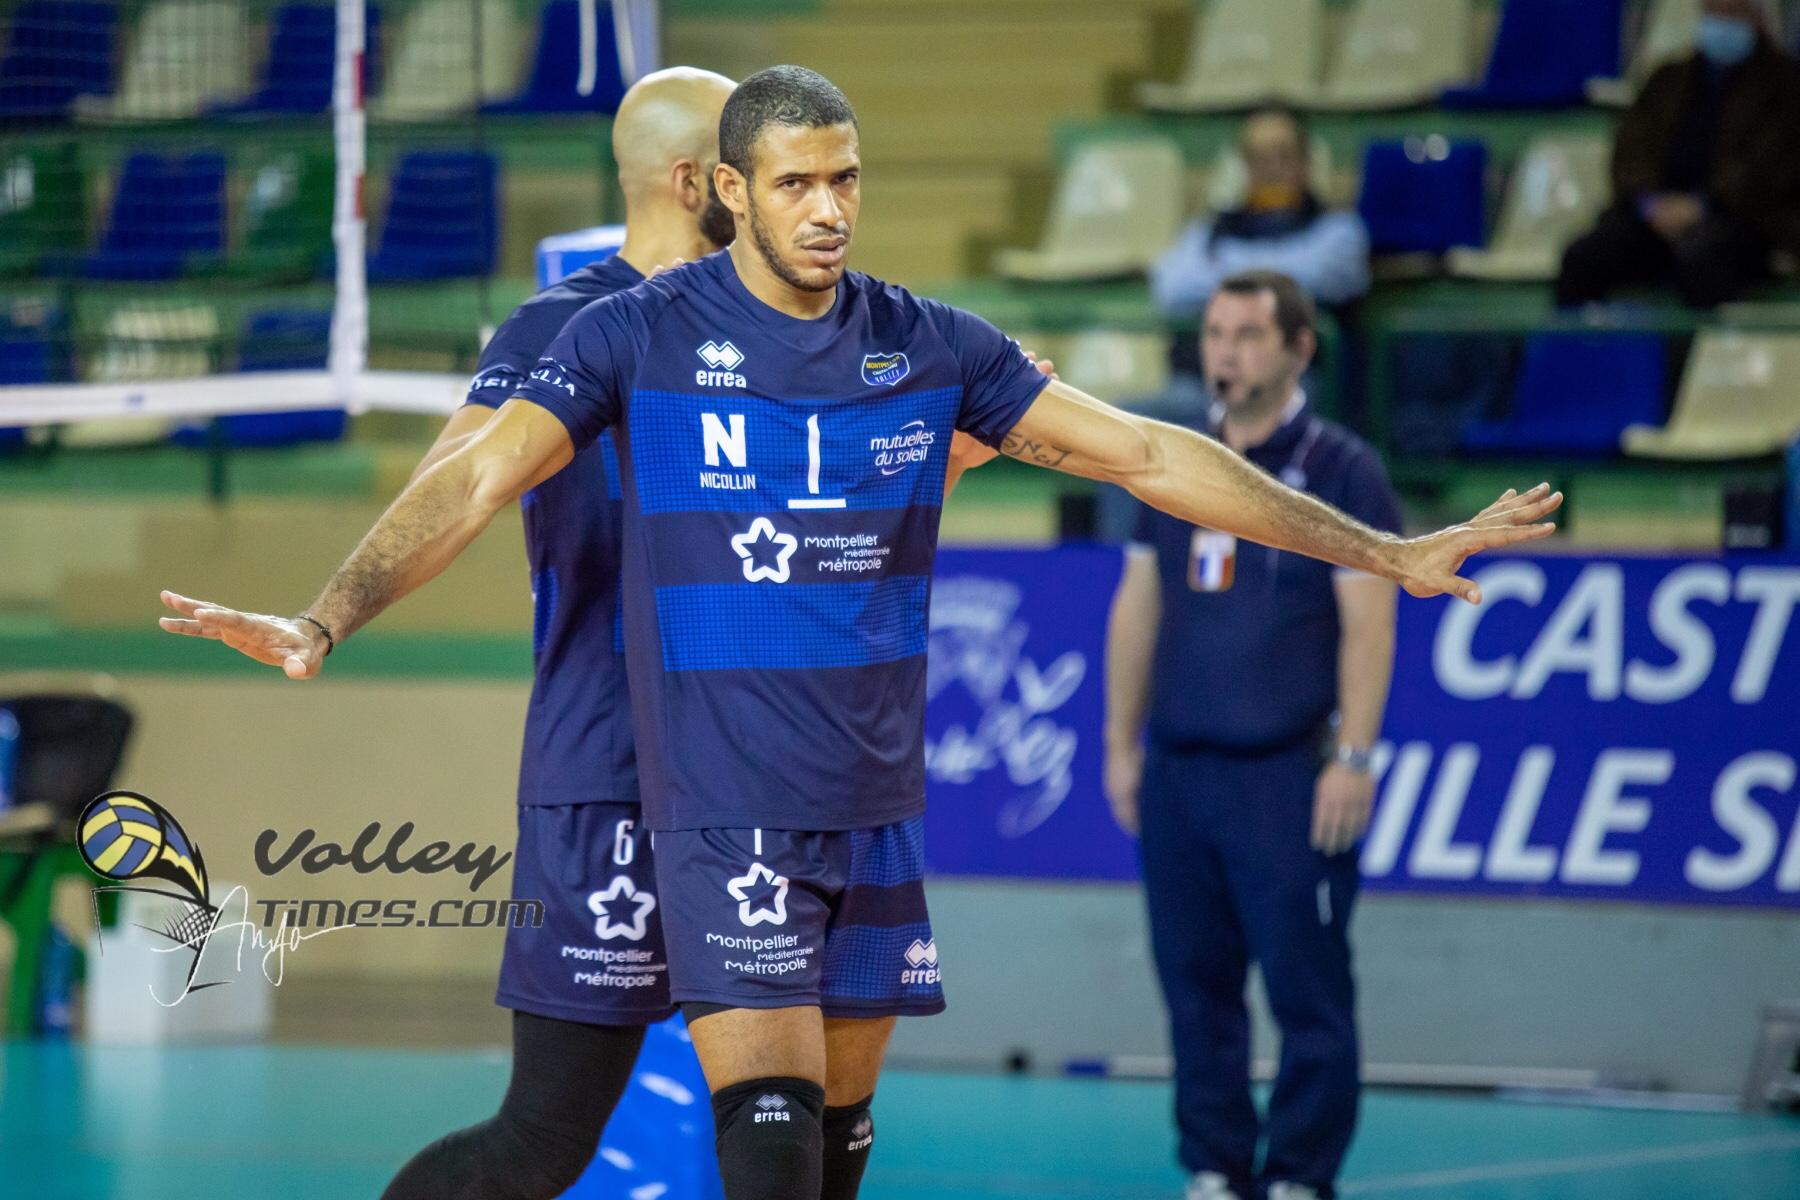 France: Javier Gonzalez stays in Montpellier, Yannick Bazin new setter of Nantes